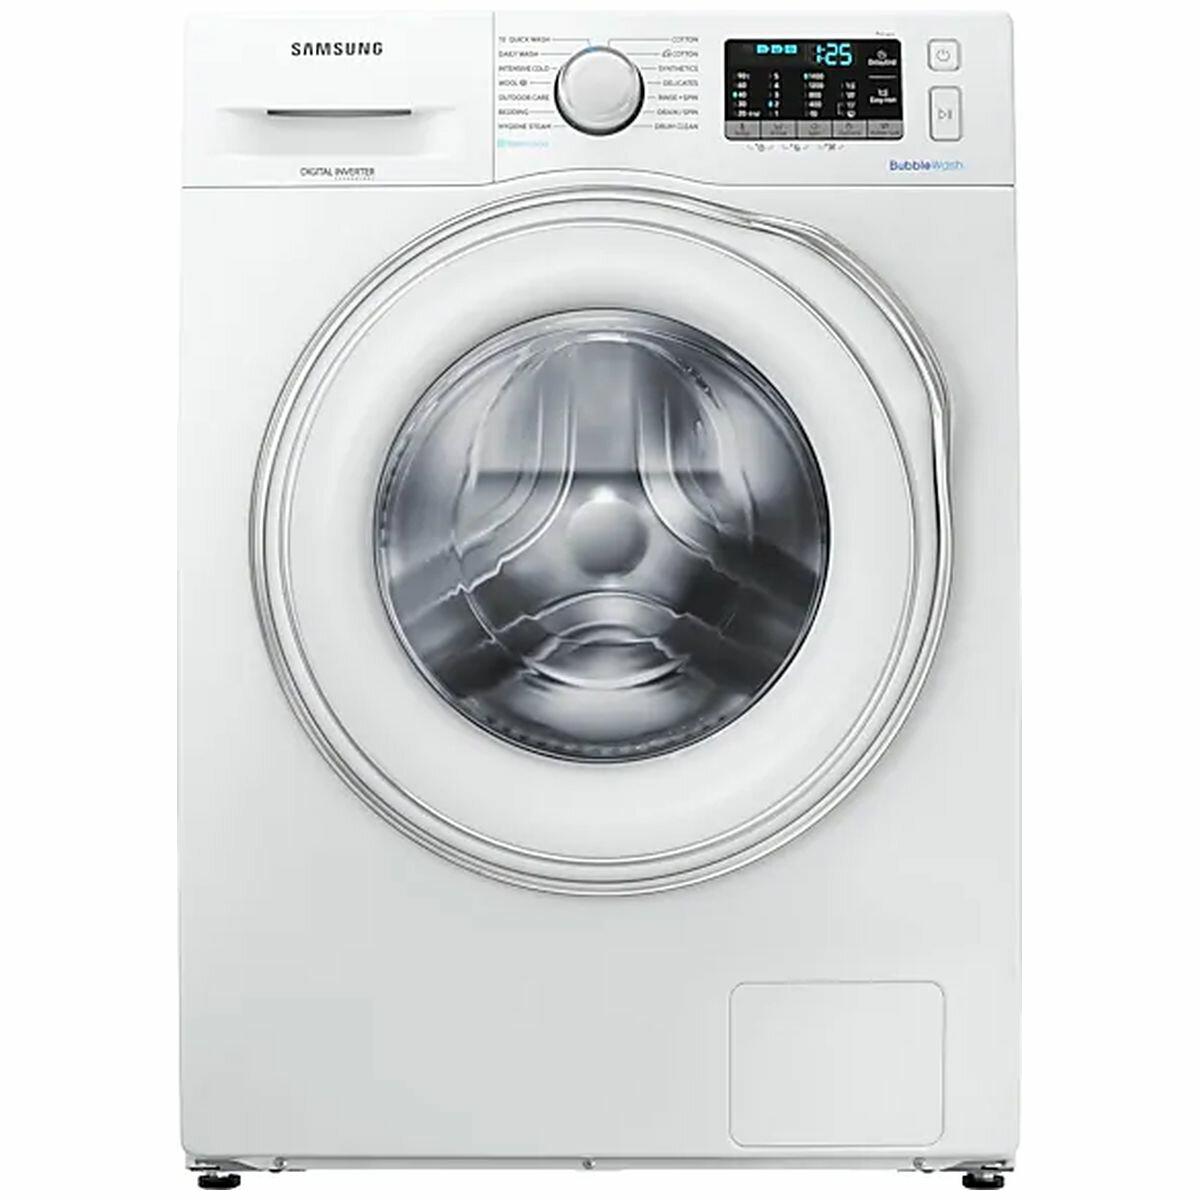 e2b84c73ca3f9077cc6d37a9015ec2c2f1bb0c5d Samsung 95kg Front Load Washing Machine WW95N54F5CW Hero high